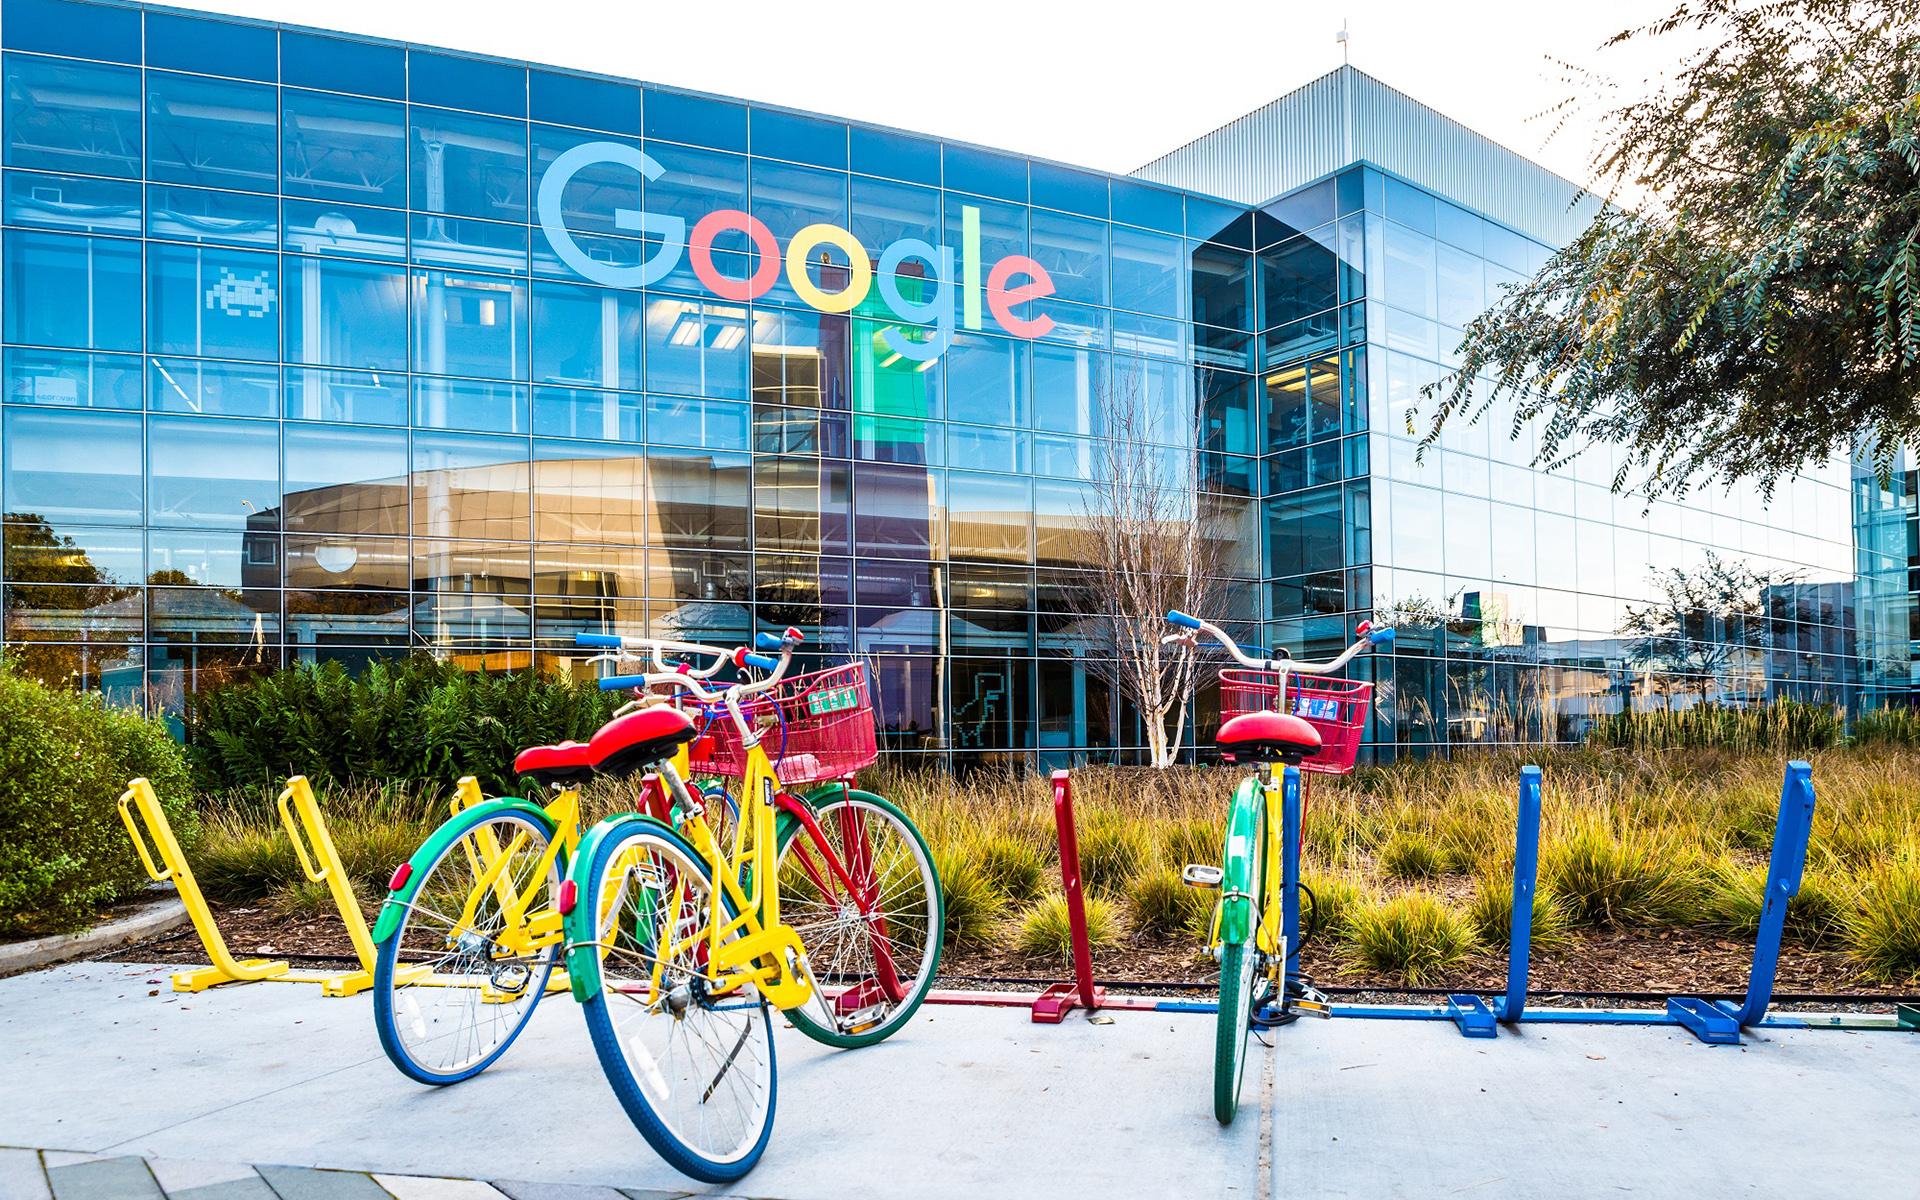 Google Usa Bicycle 1920x1200